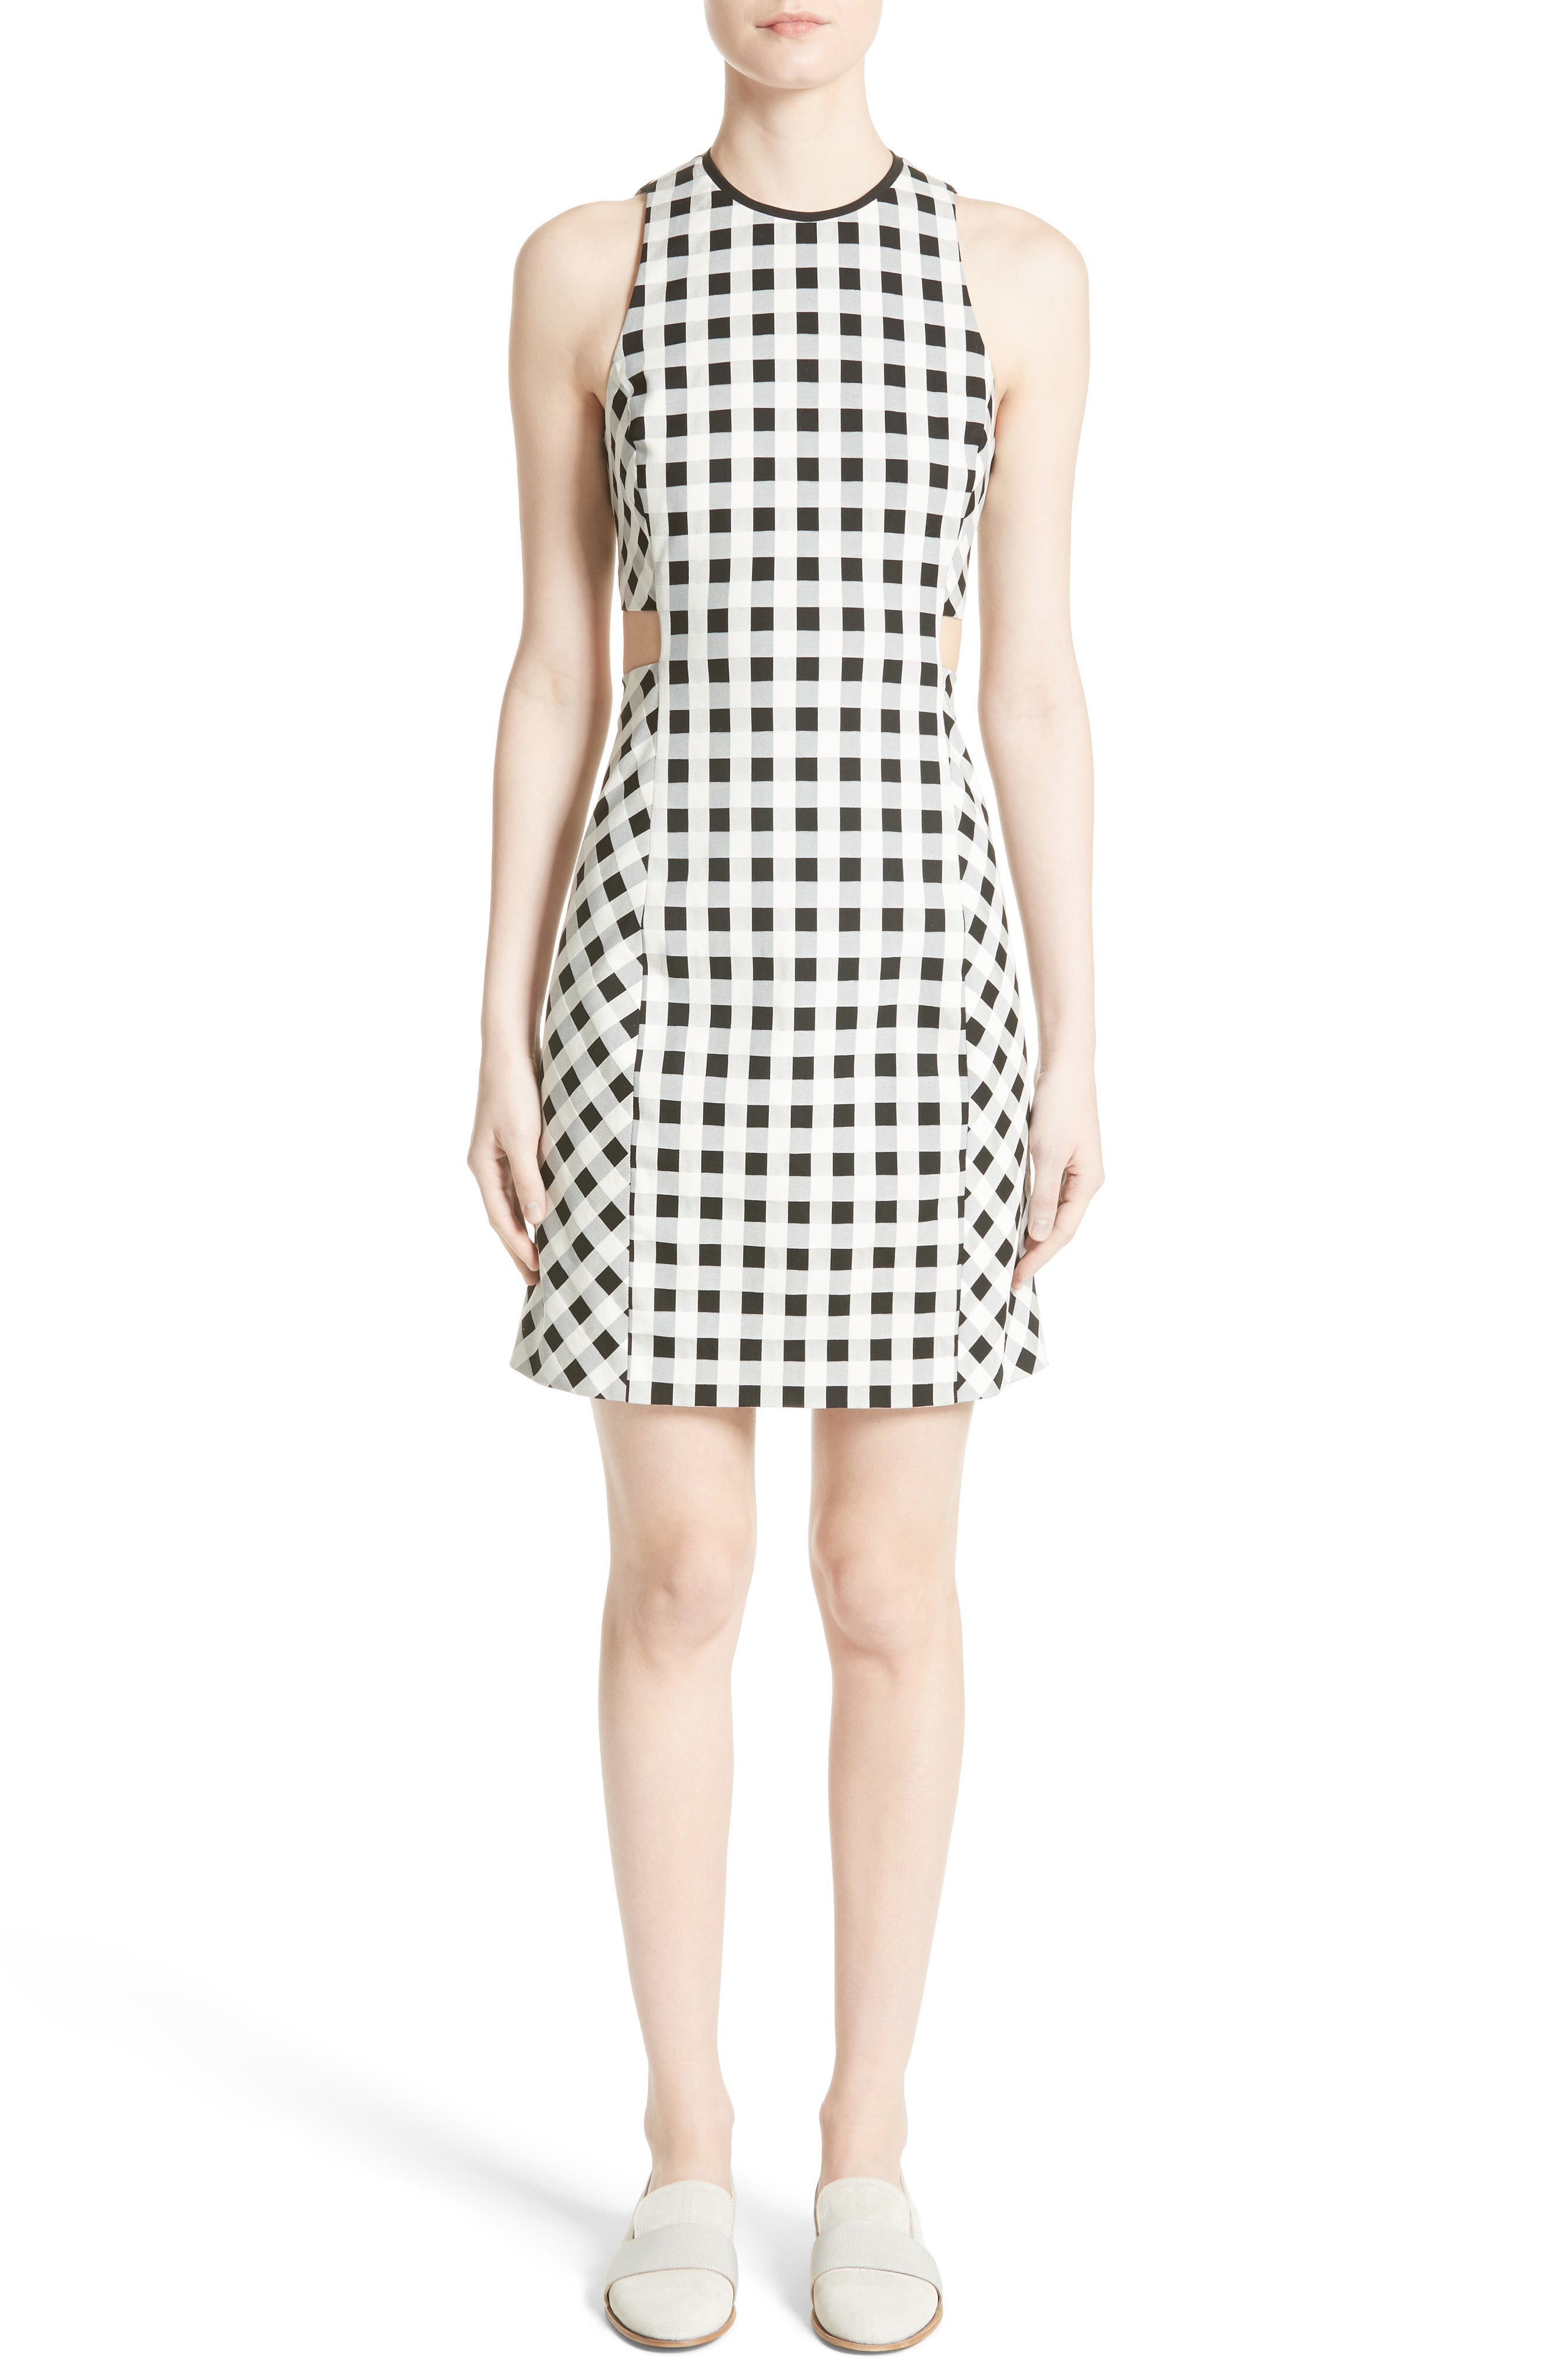 Tahoe Gingham Dress,                         Main,                         color, BLACK/ WHITE